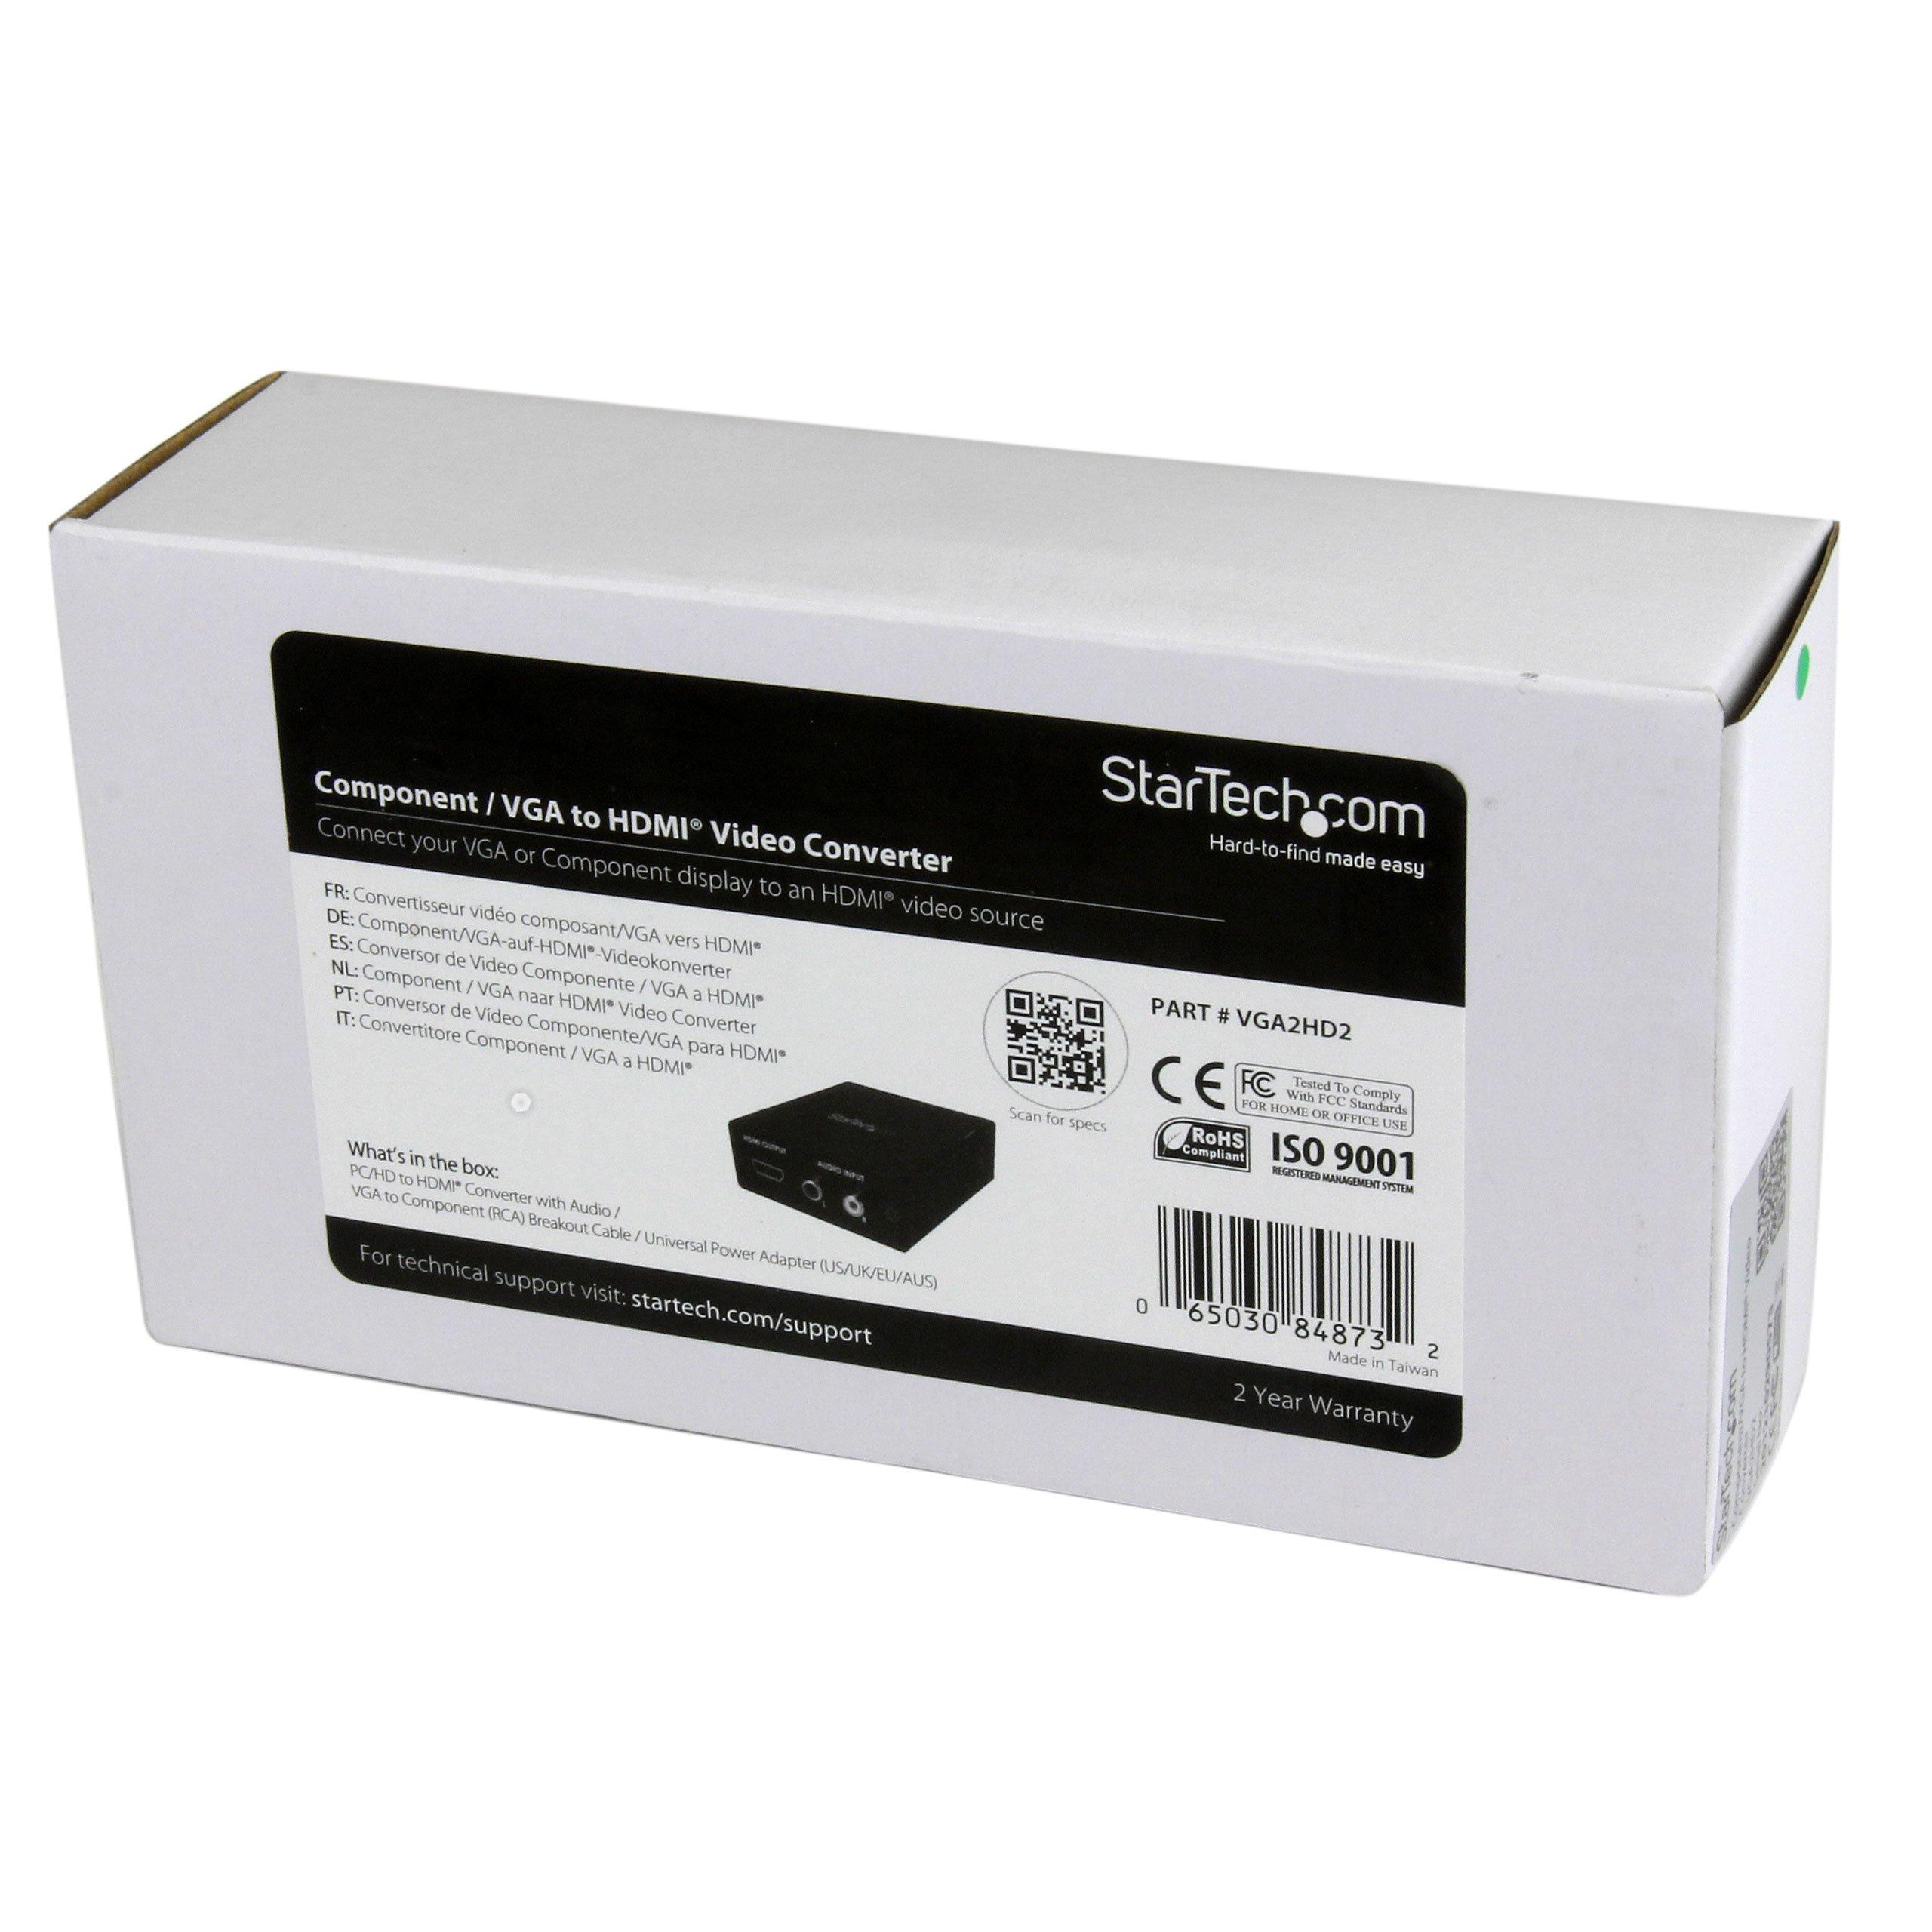 StarTech.com VGA2HD2 1920 x 1200 1080p Component/VGA to HDMI Audio Converter by StarTech